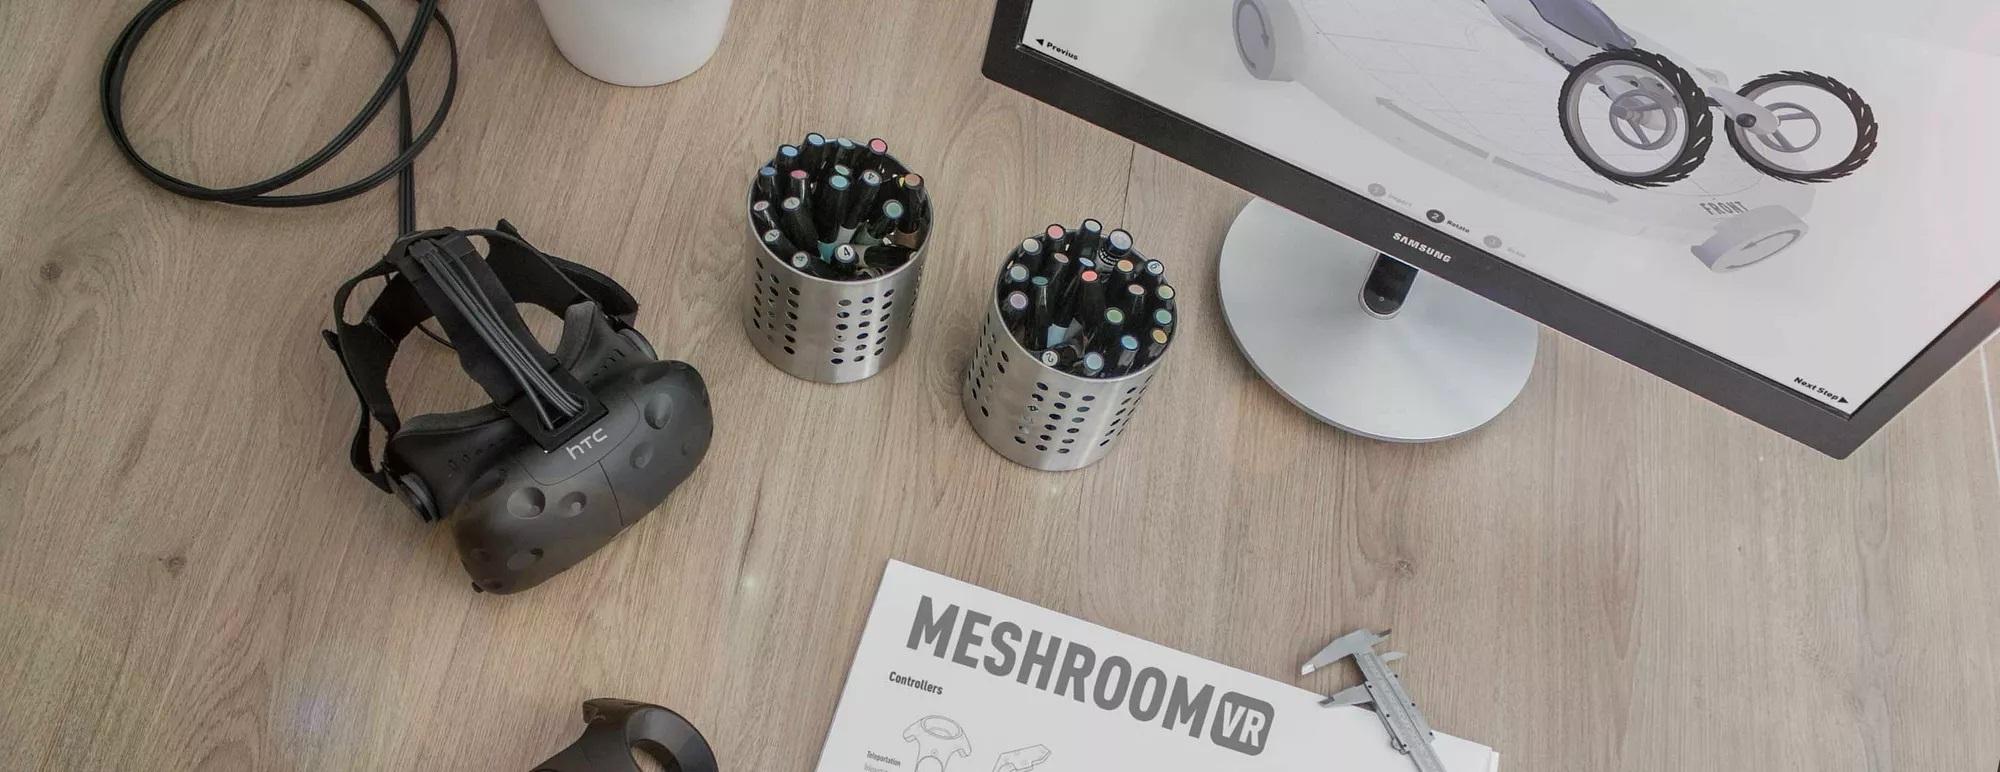 MeshroomVR devient WEVIZ